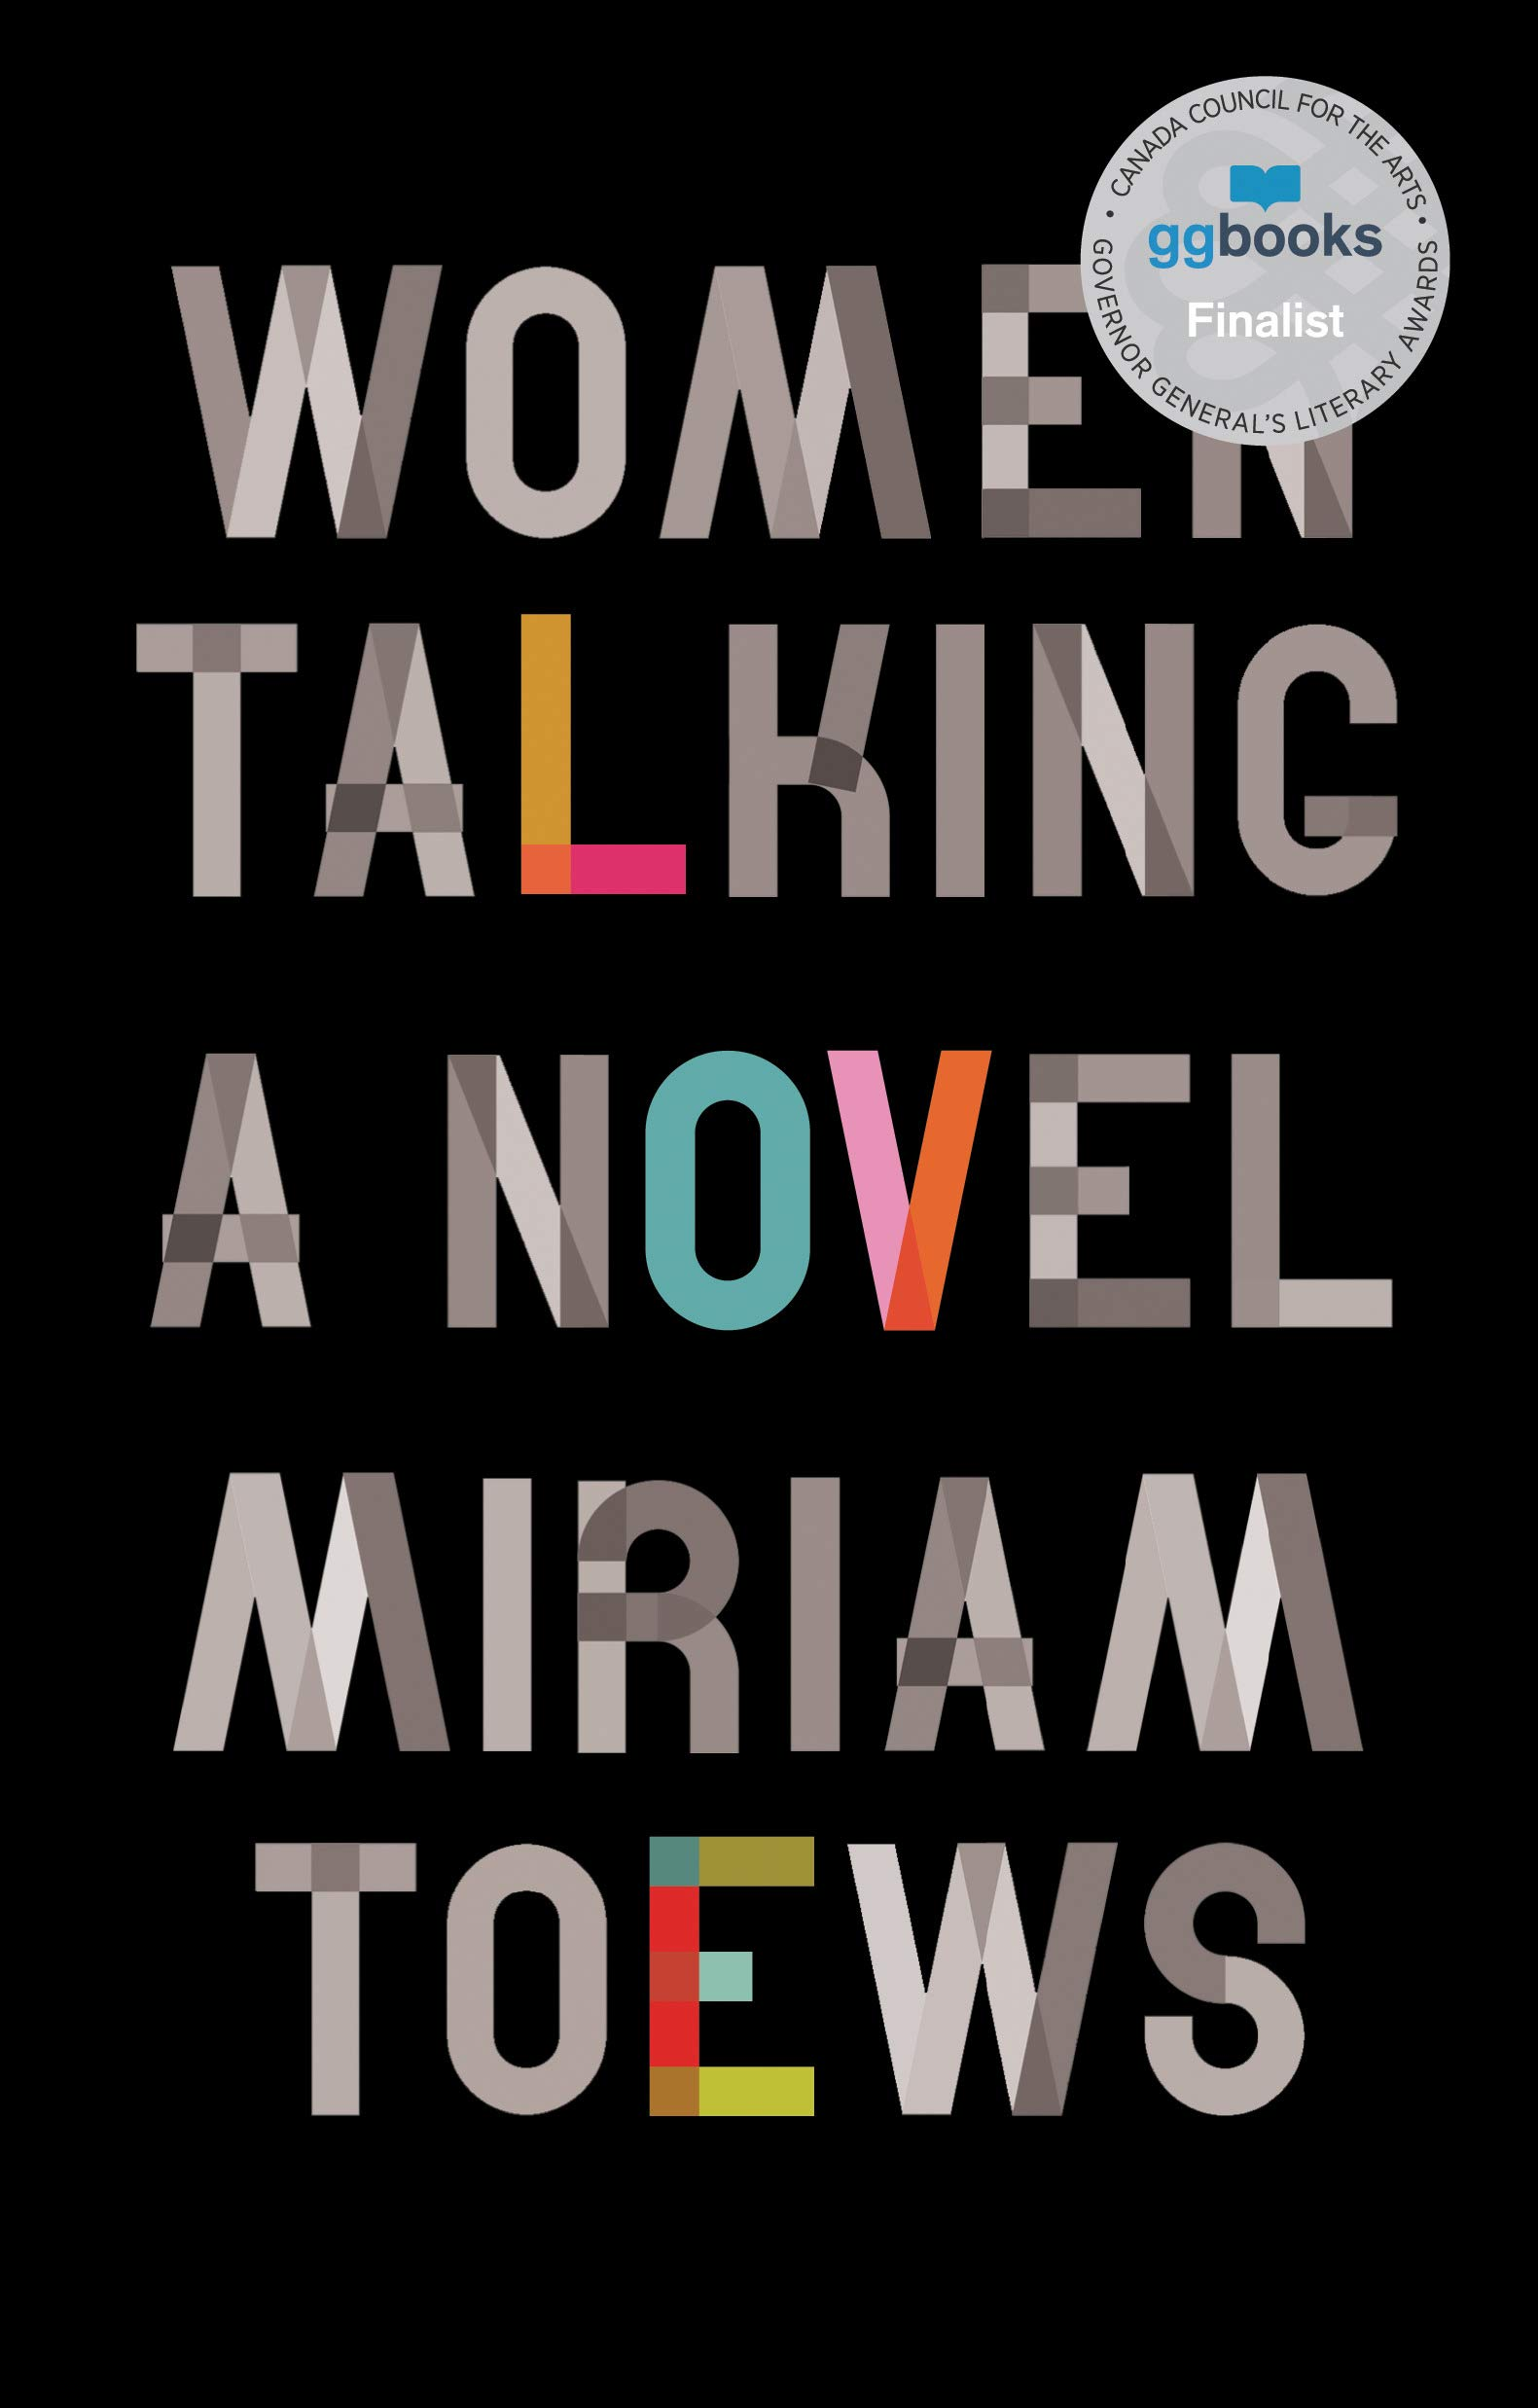 Women Talking: A Novel: Toews, Miriam: 9780735273962: Books - spring-themed novels